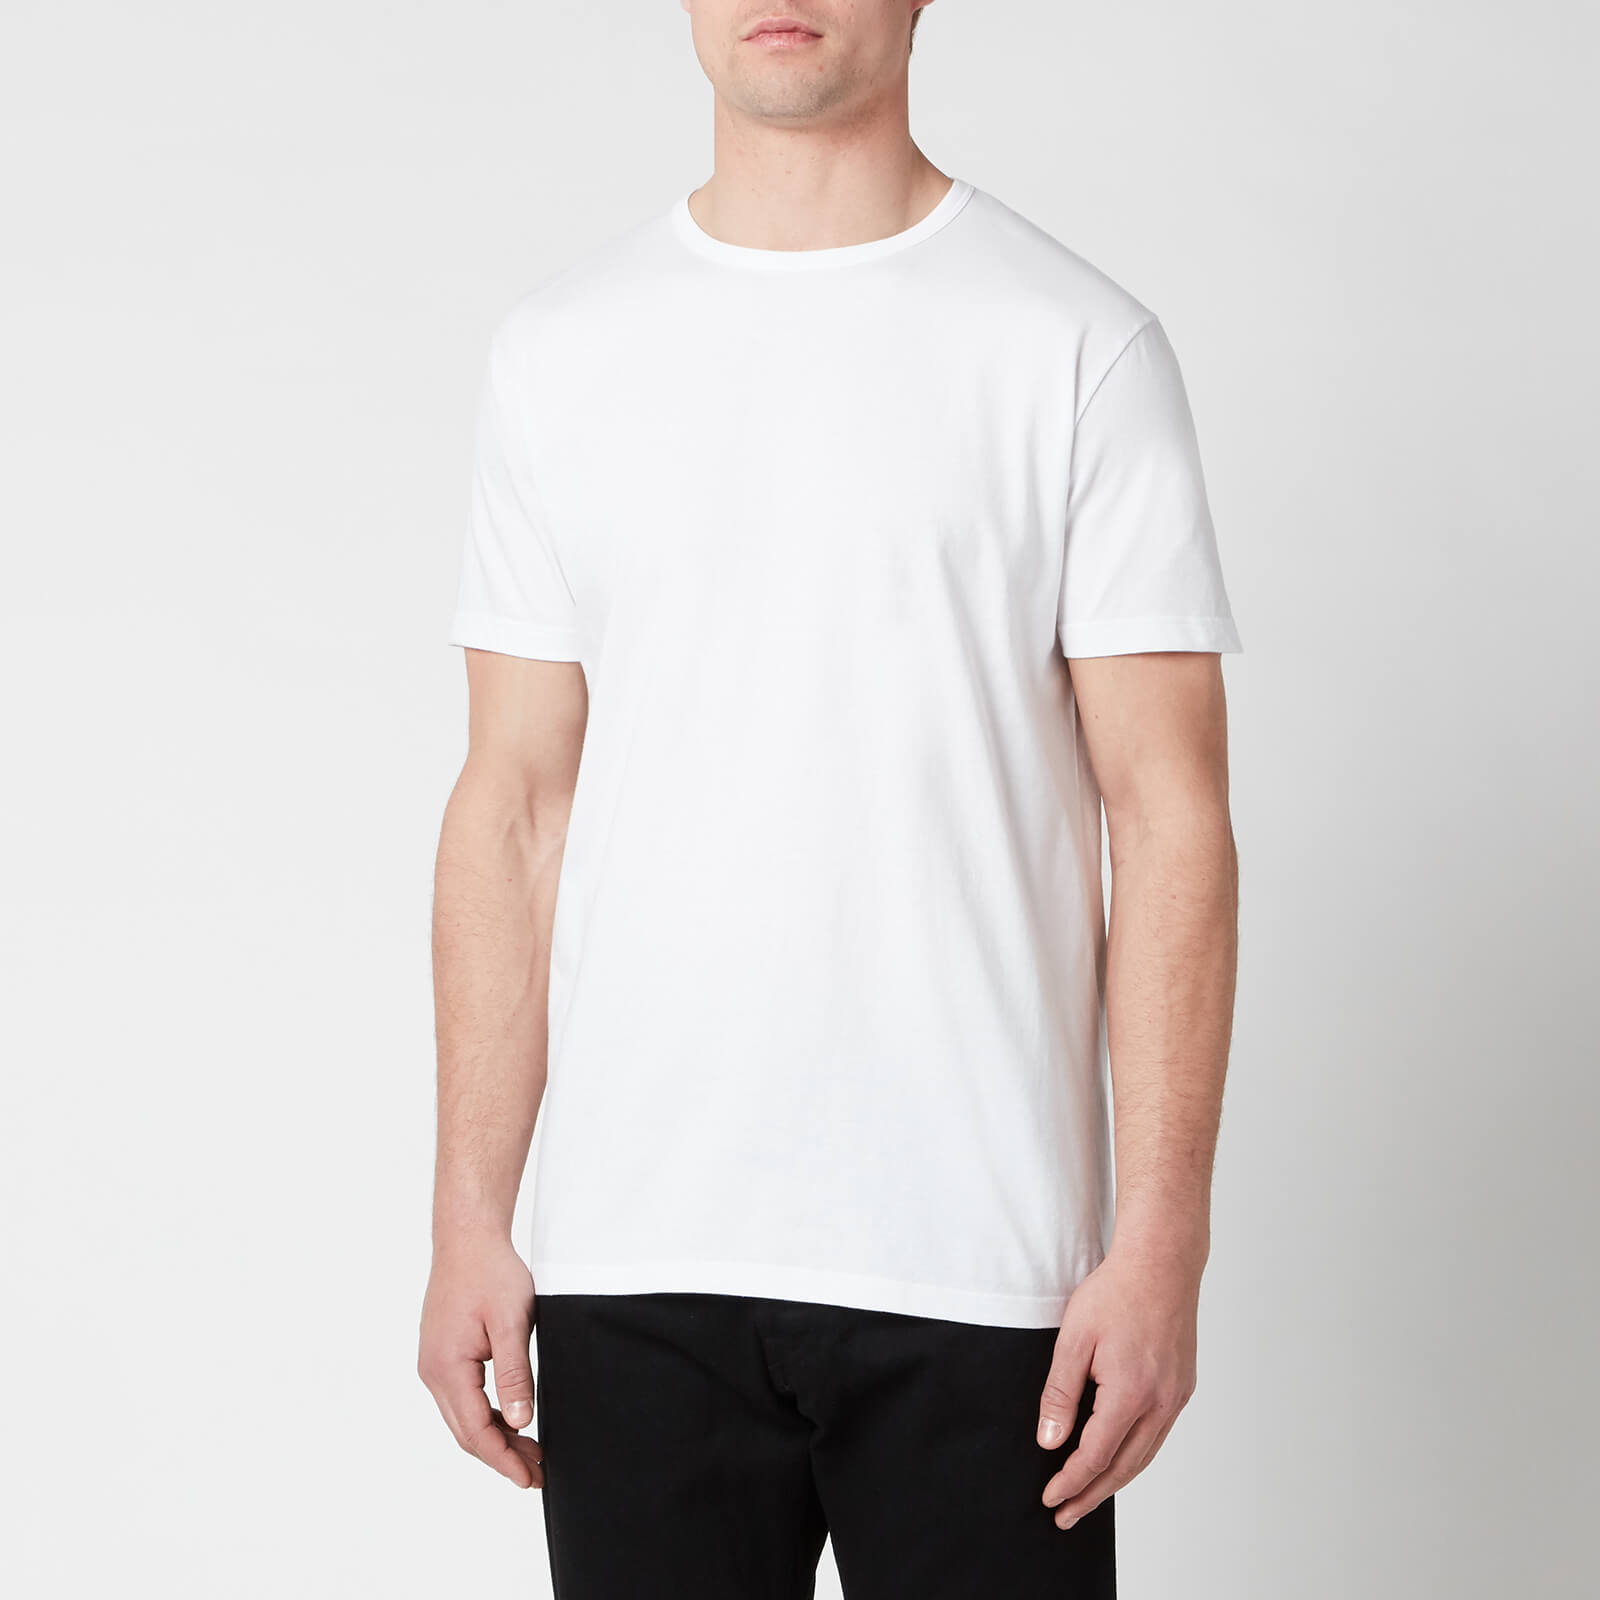 Edwin Men's Double Pack Short Sleeve T-Shirt - White - L